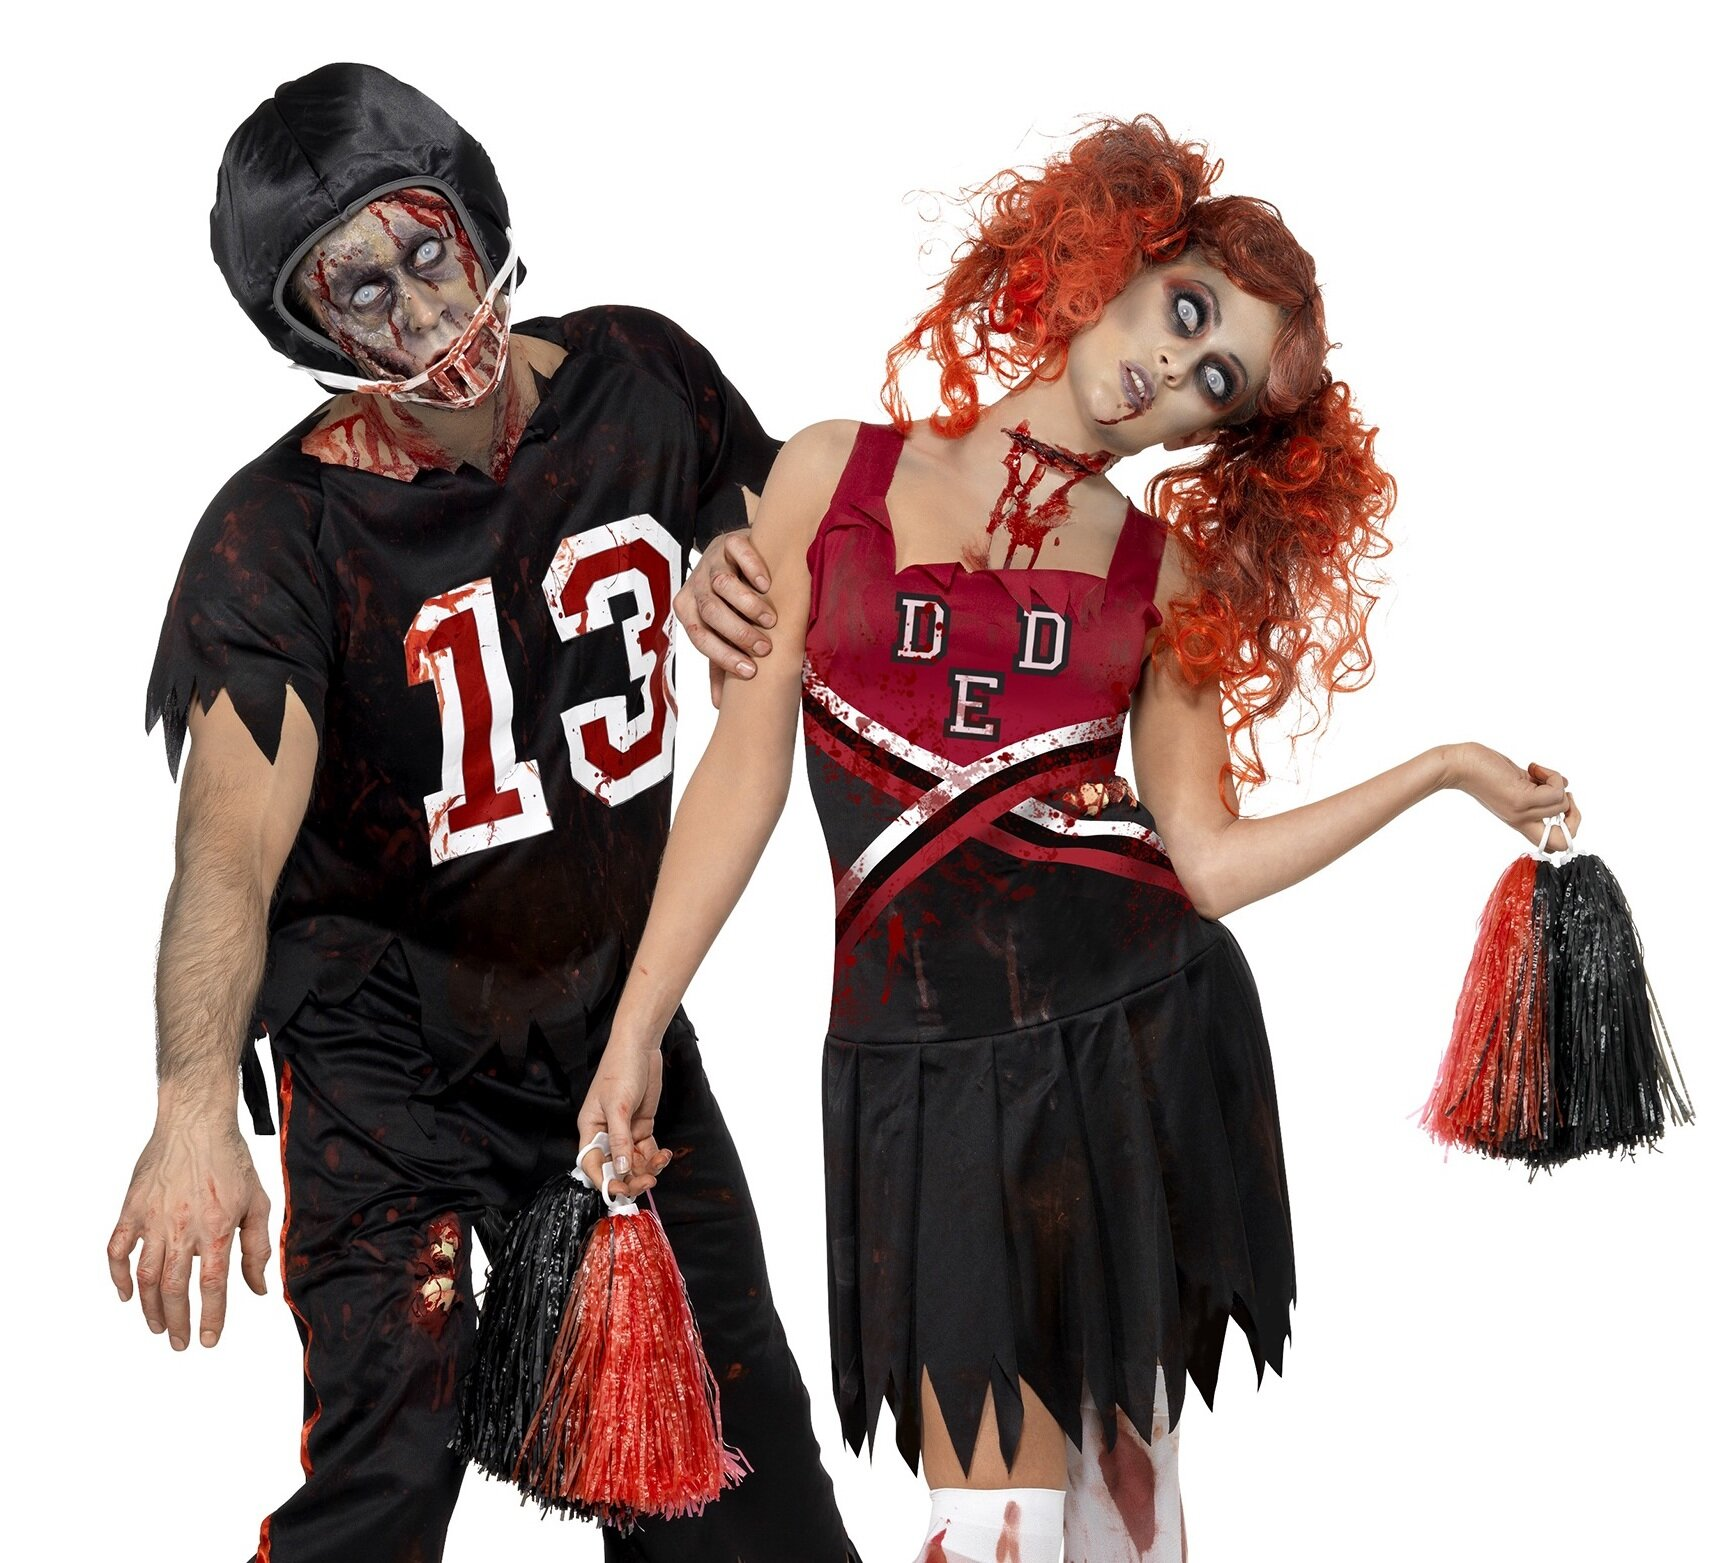 Zombie Jocks and Fearleaders  - Movie Night Hallowe'en - Tuesday, Oct 29